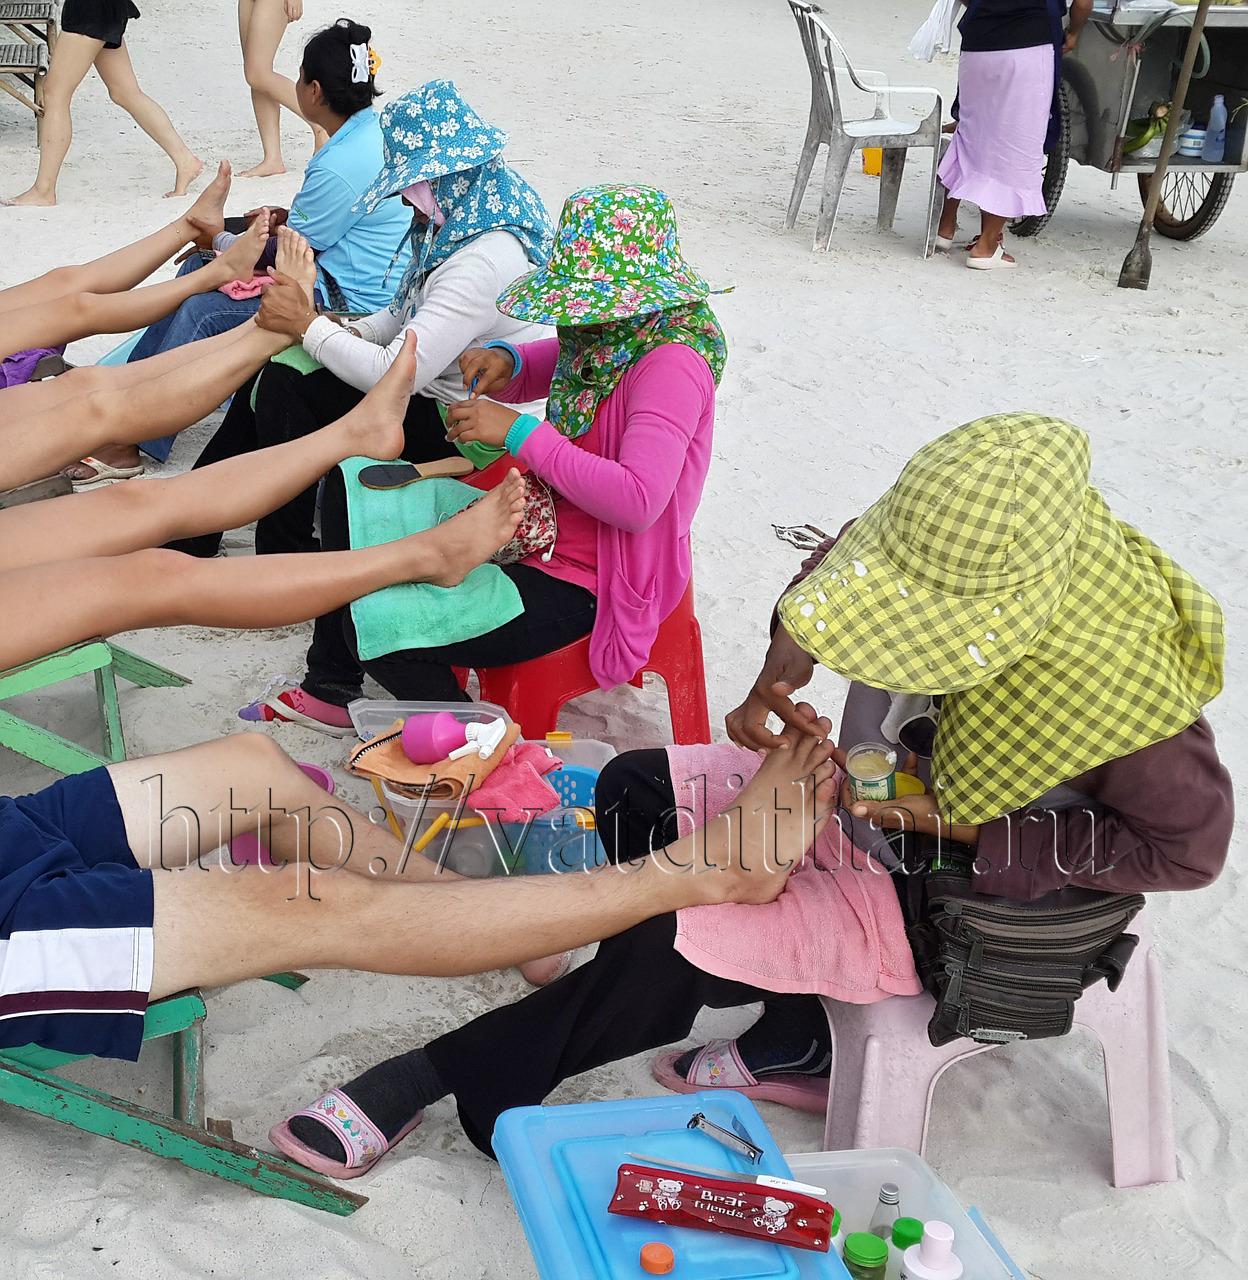 Пришла с мужем на тайский массаж онлайн 27 фотография